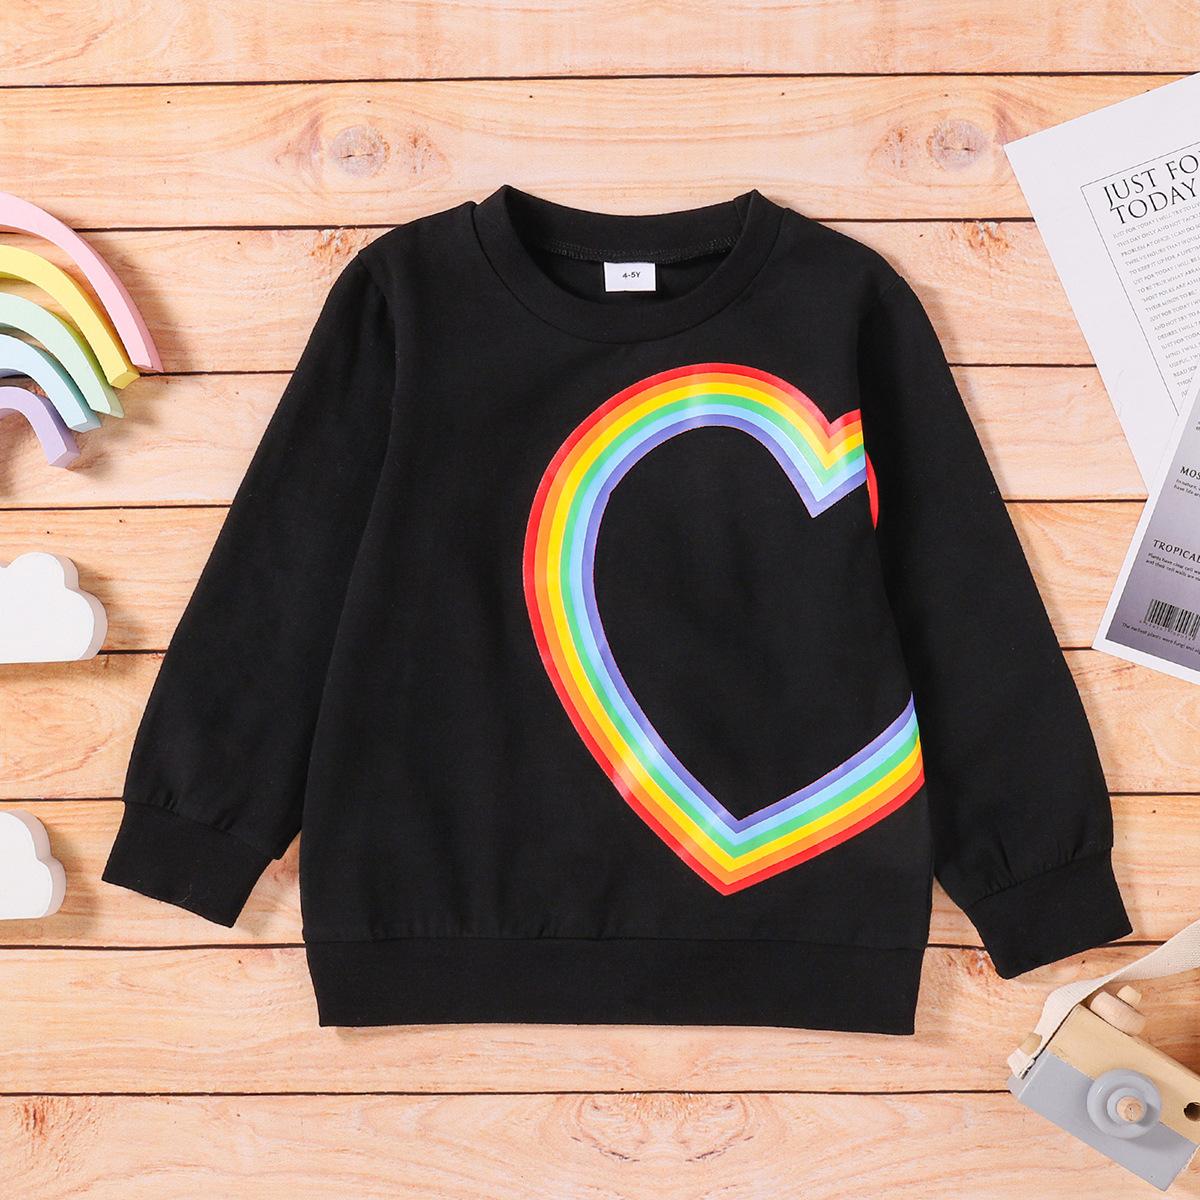 LW COTTON Boy Rainbow Heart Print Sweatshirt